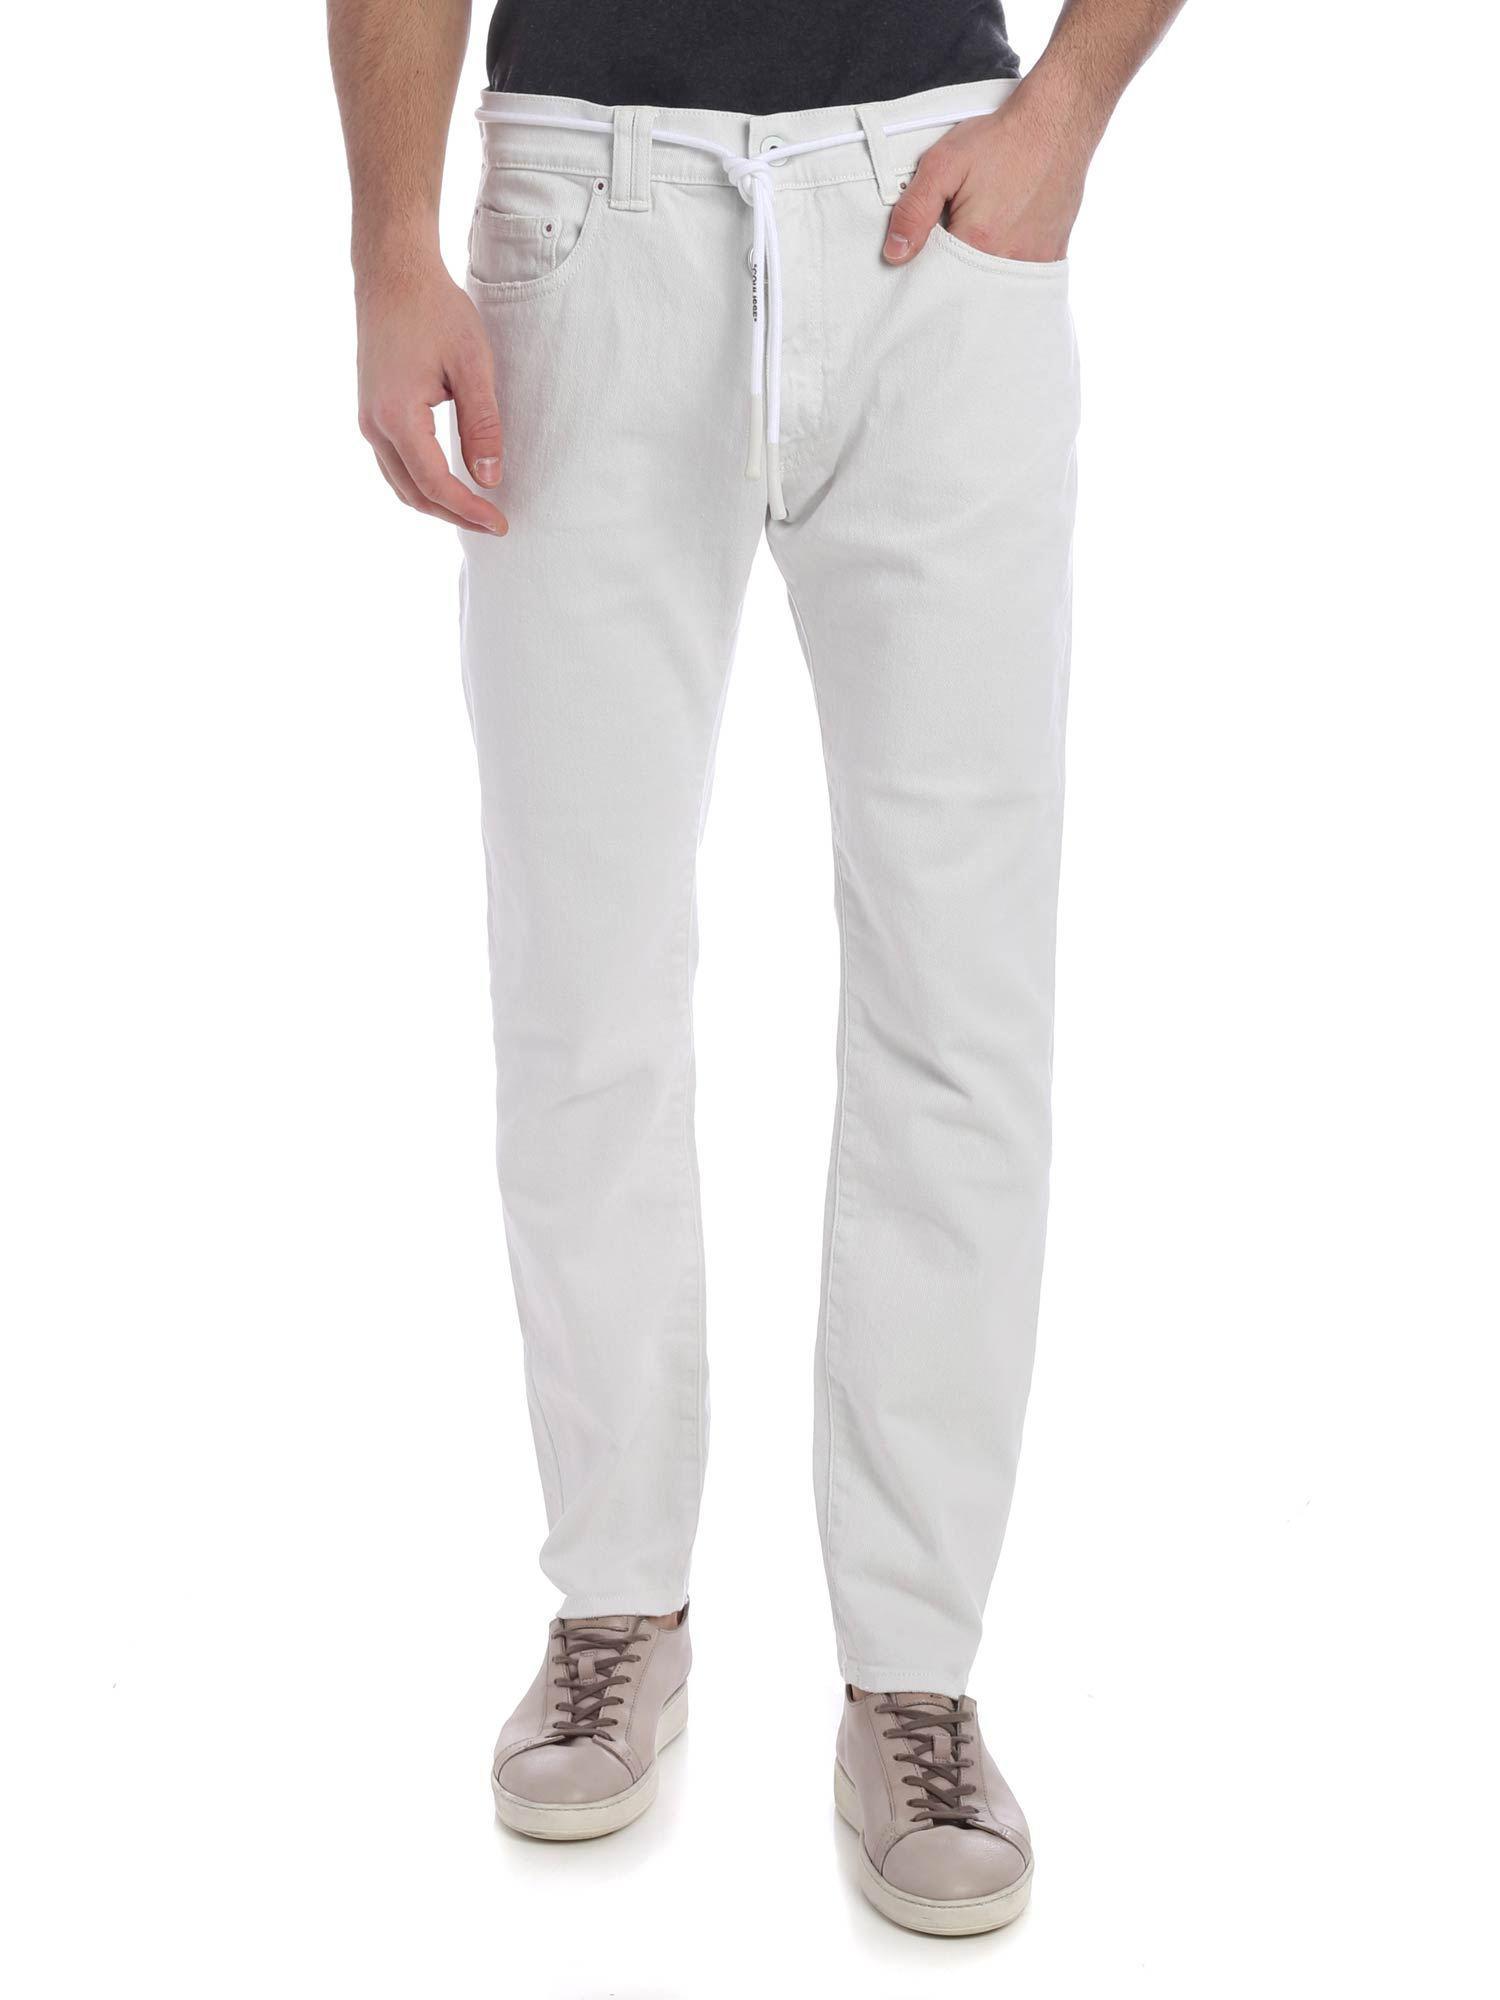 70a0e411e8c Lyst - Off-White c o Virgil Abloh 5 Pocket White Off White Jeans in ...